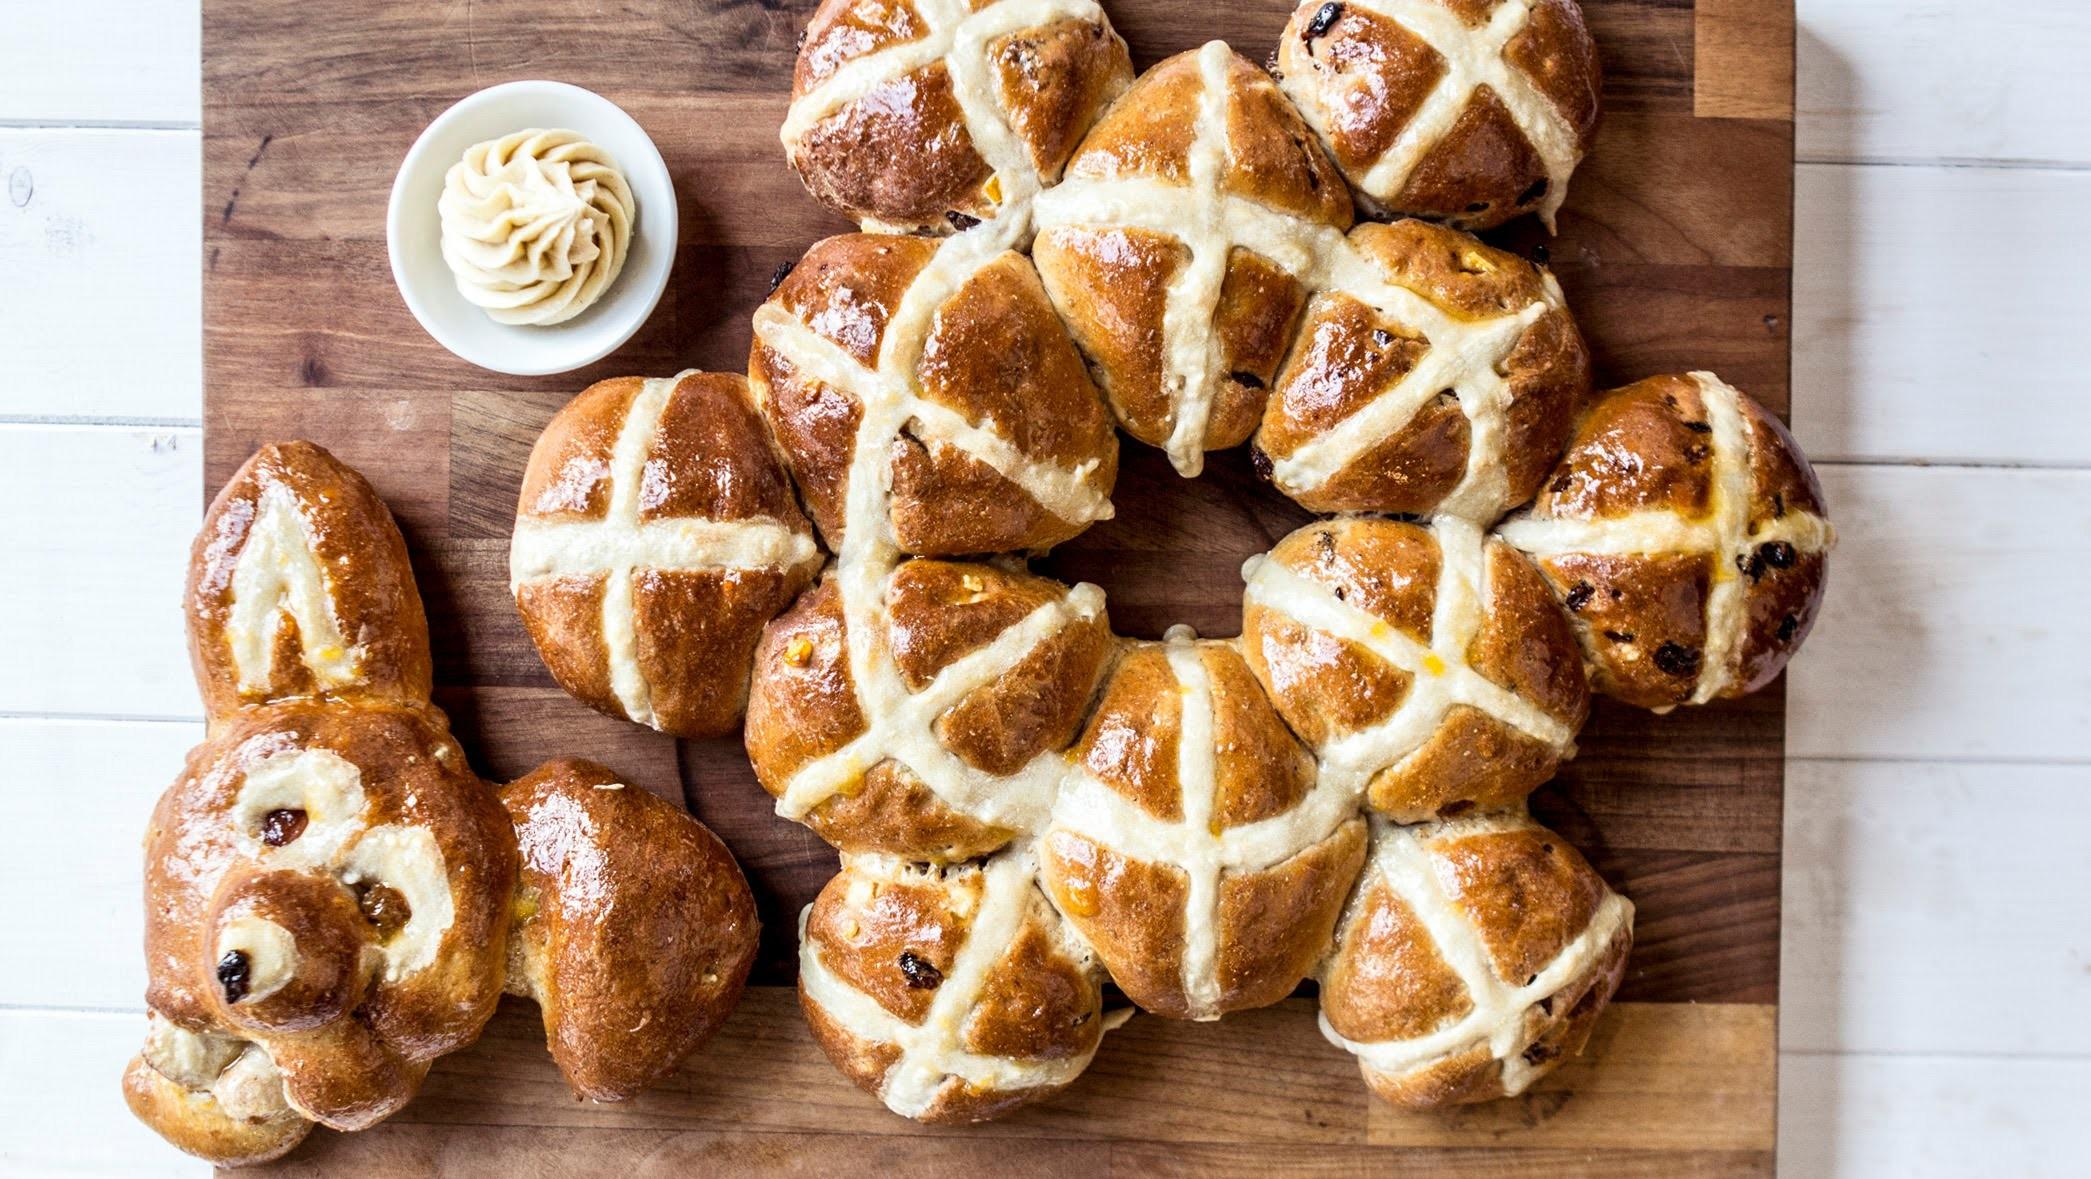 Easter Homemade Hot Cross Buns Recipe - SORTED (Spon)